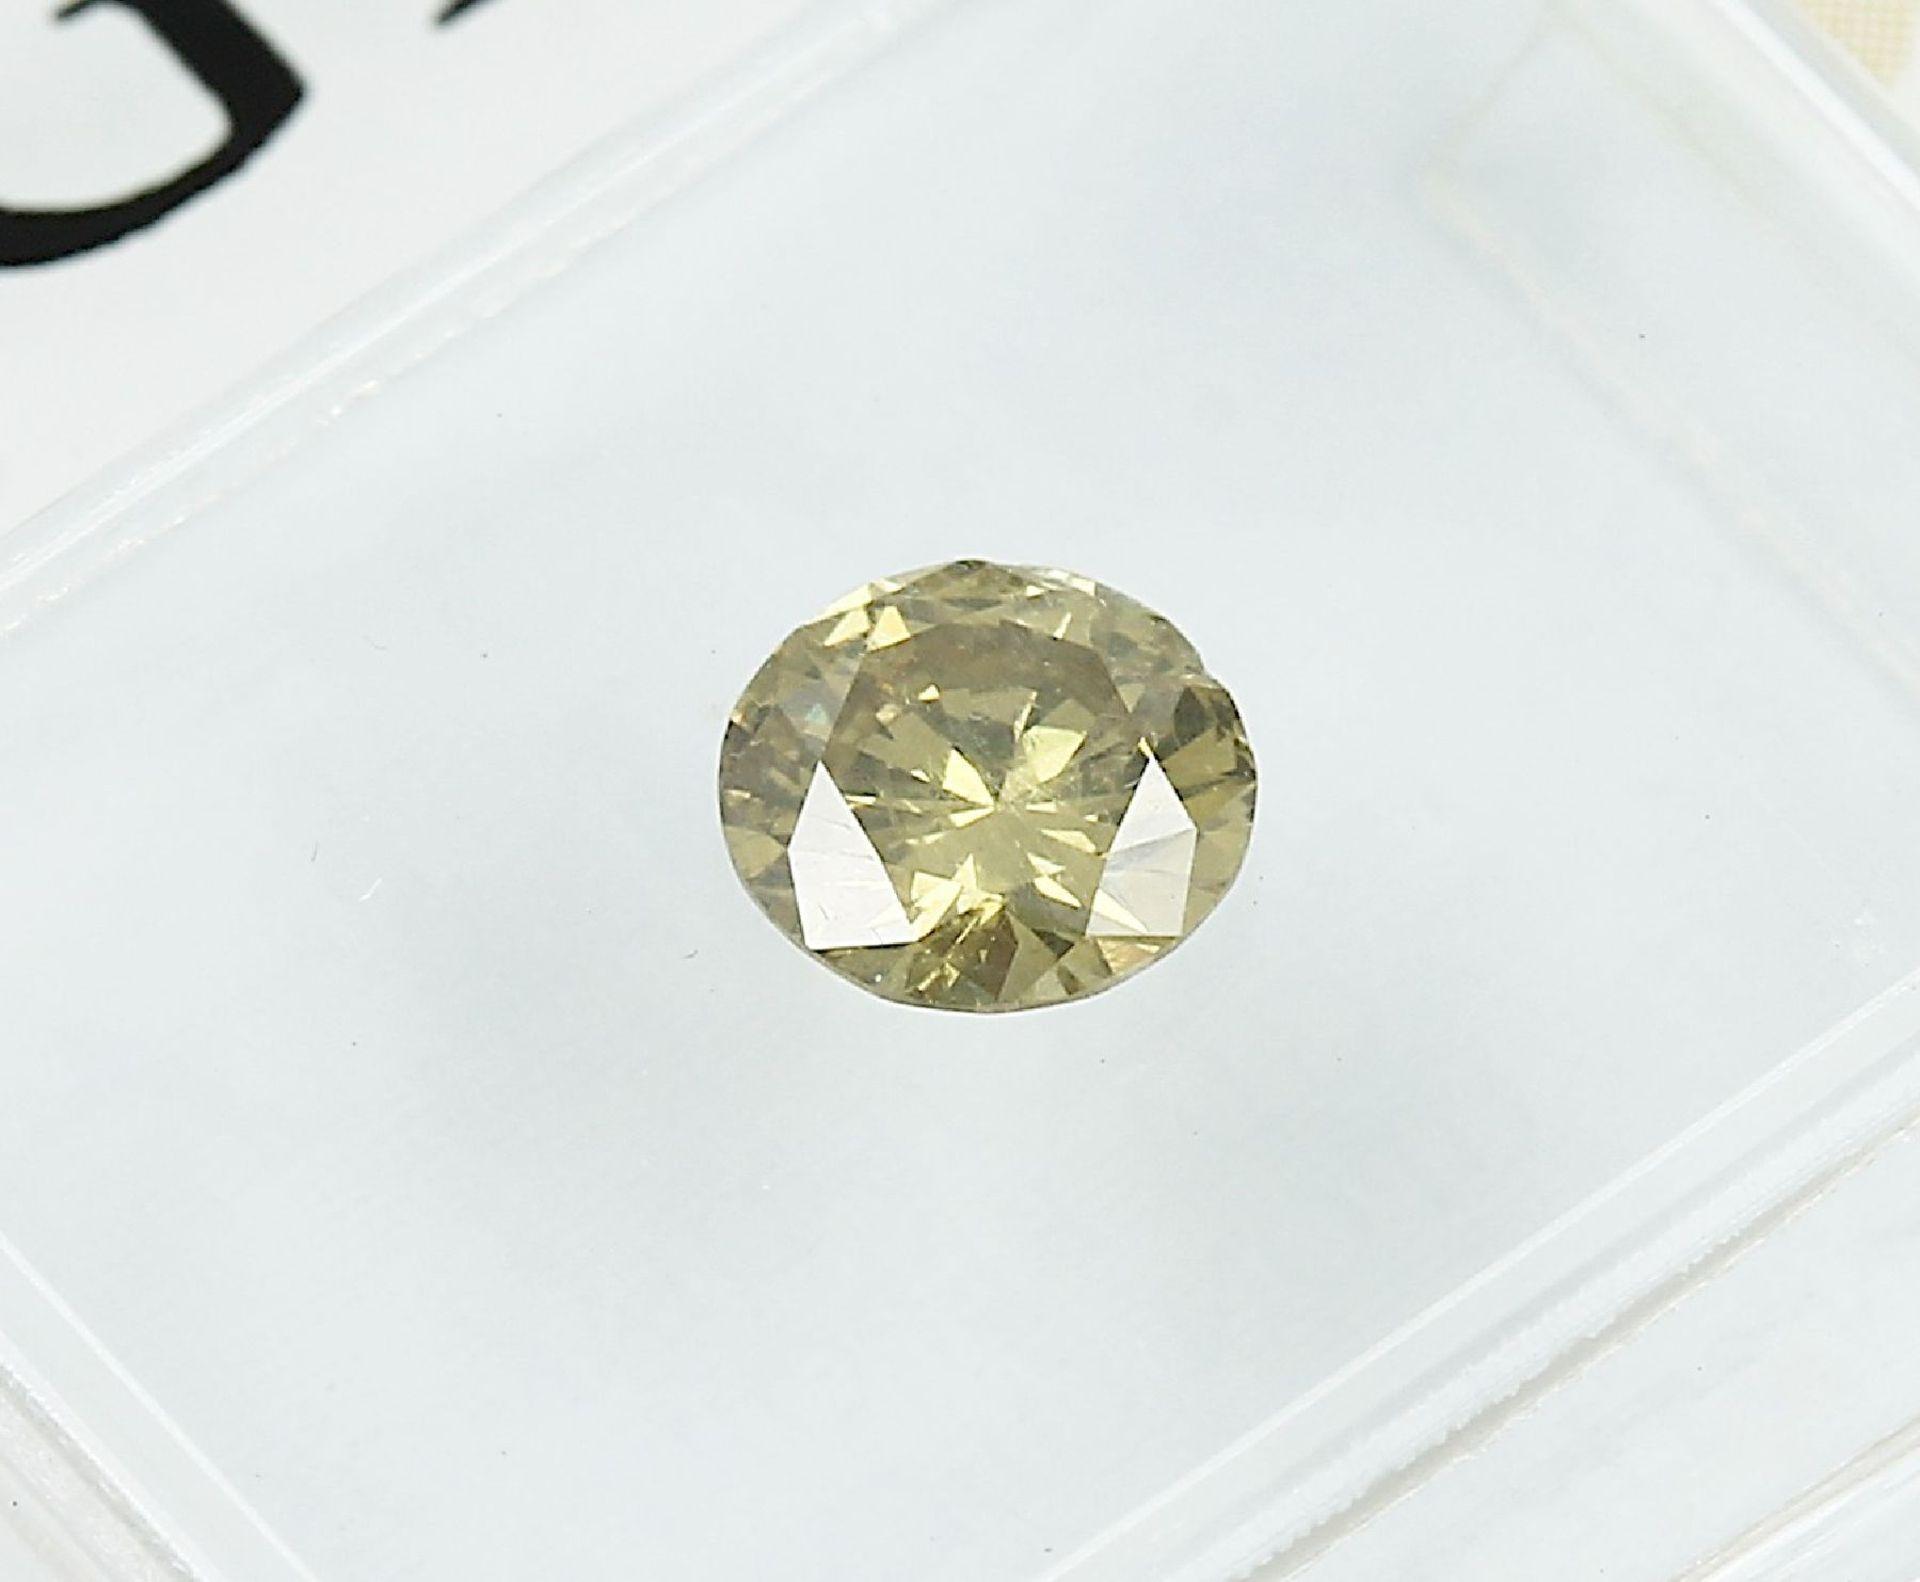 Loser Brillant, 0.49 ct Natural fancy deep brownish greenish yellow, 5.12-5.25 x 2.98 mm, - Bild 2 aus 3